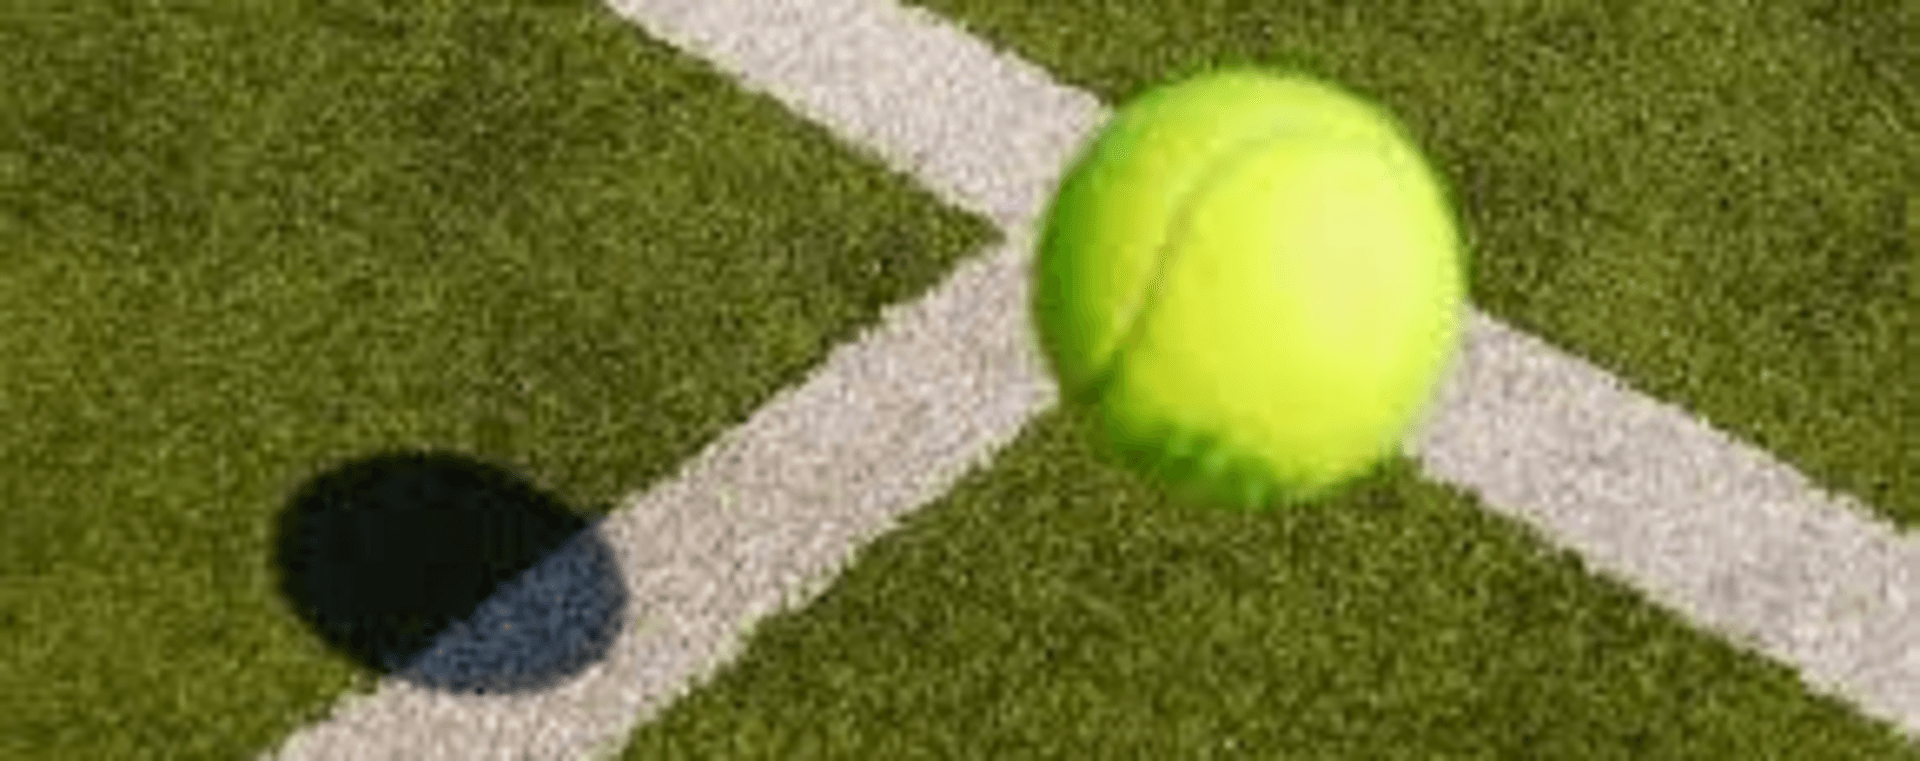 08-tennisbal-lijn-1920x761px-v4